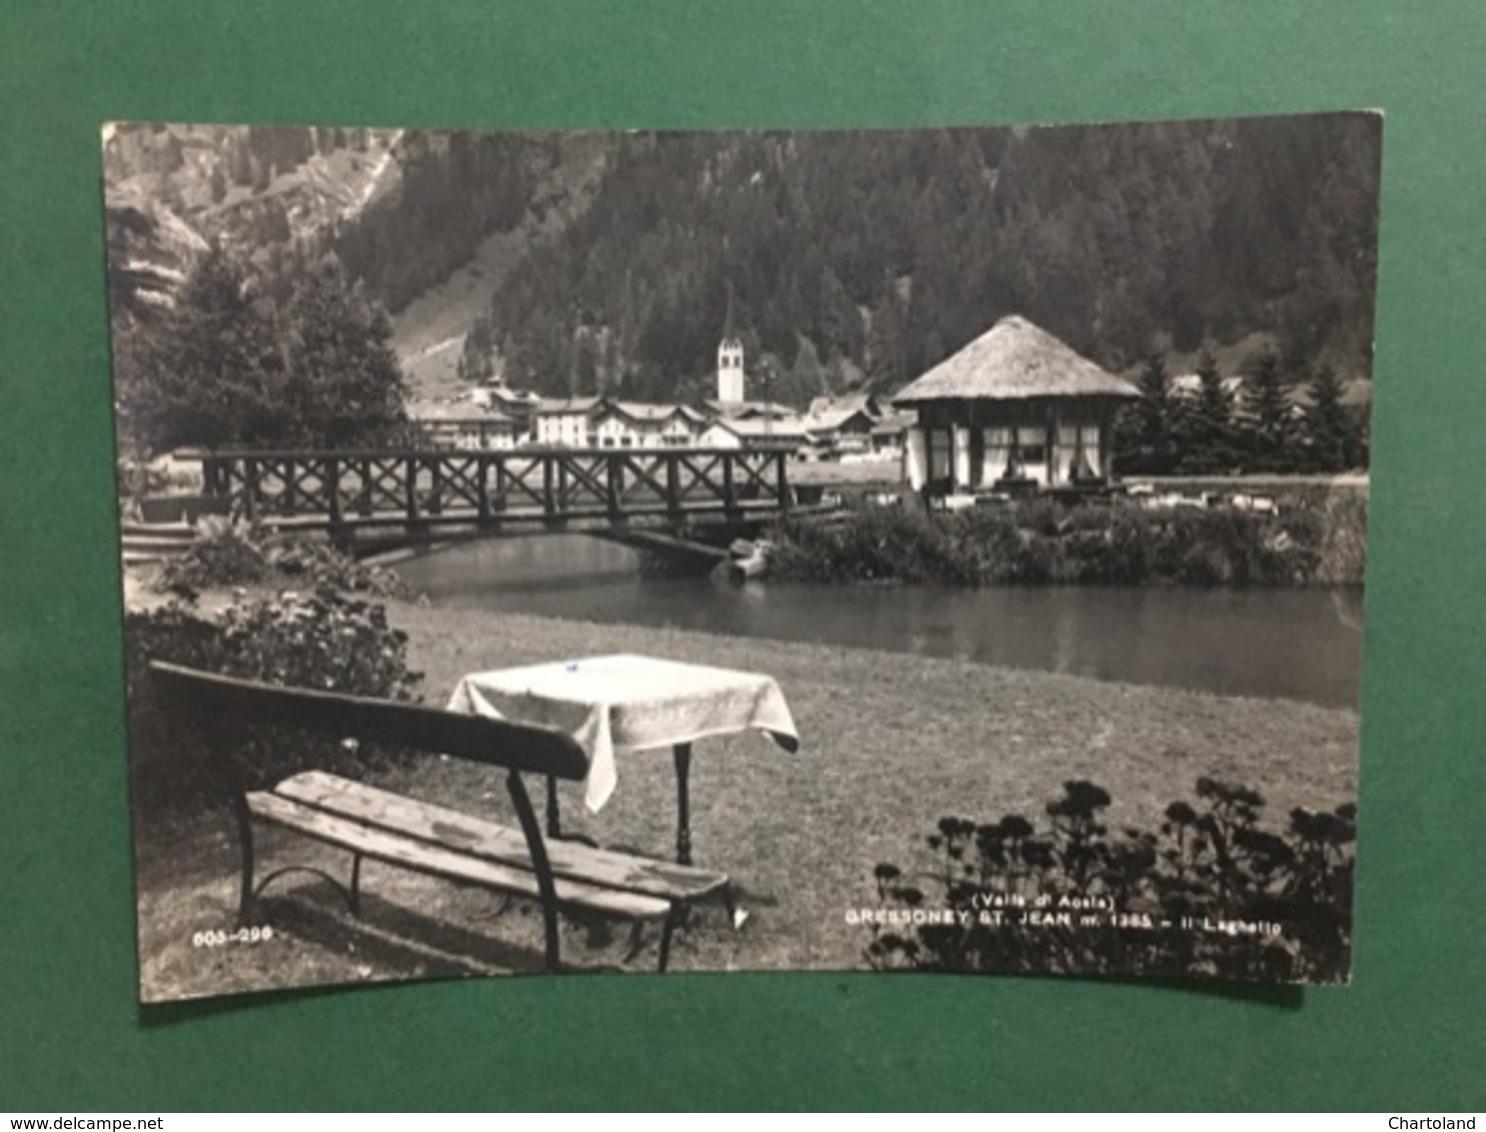 Cartolina Valle D'Aosta - Gressoney St. Jean - Il Laghetto - 1960 - Italy